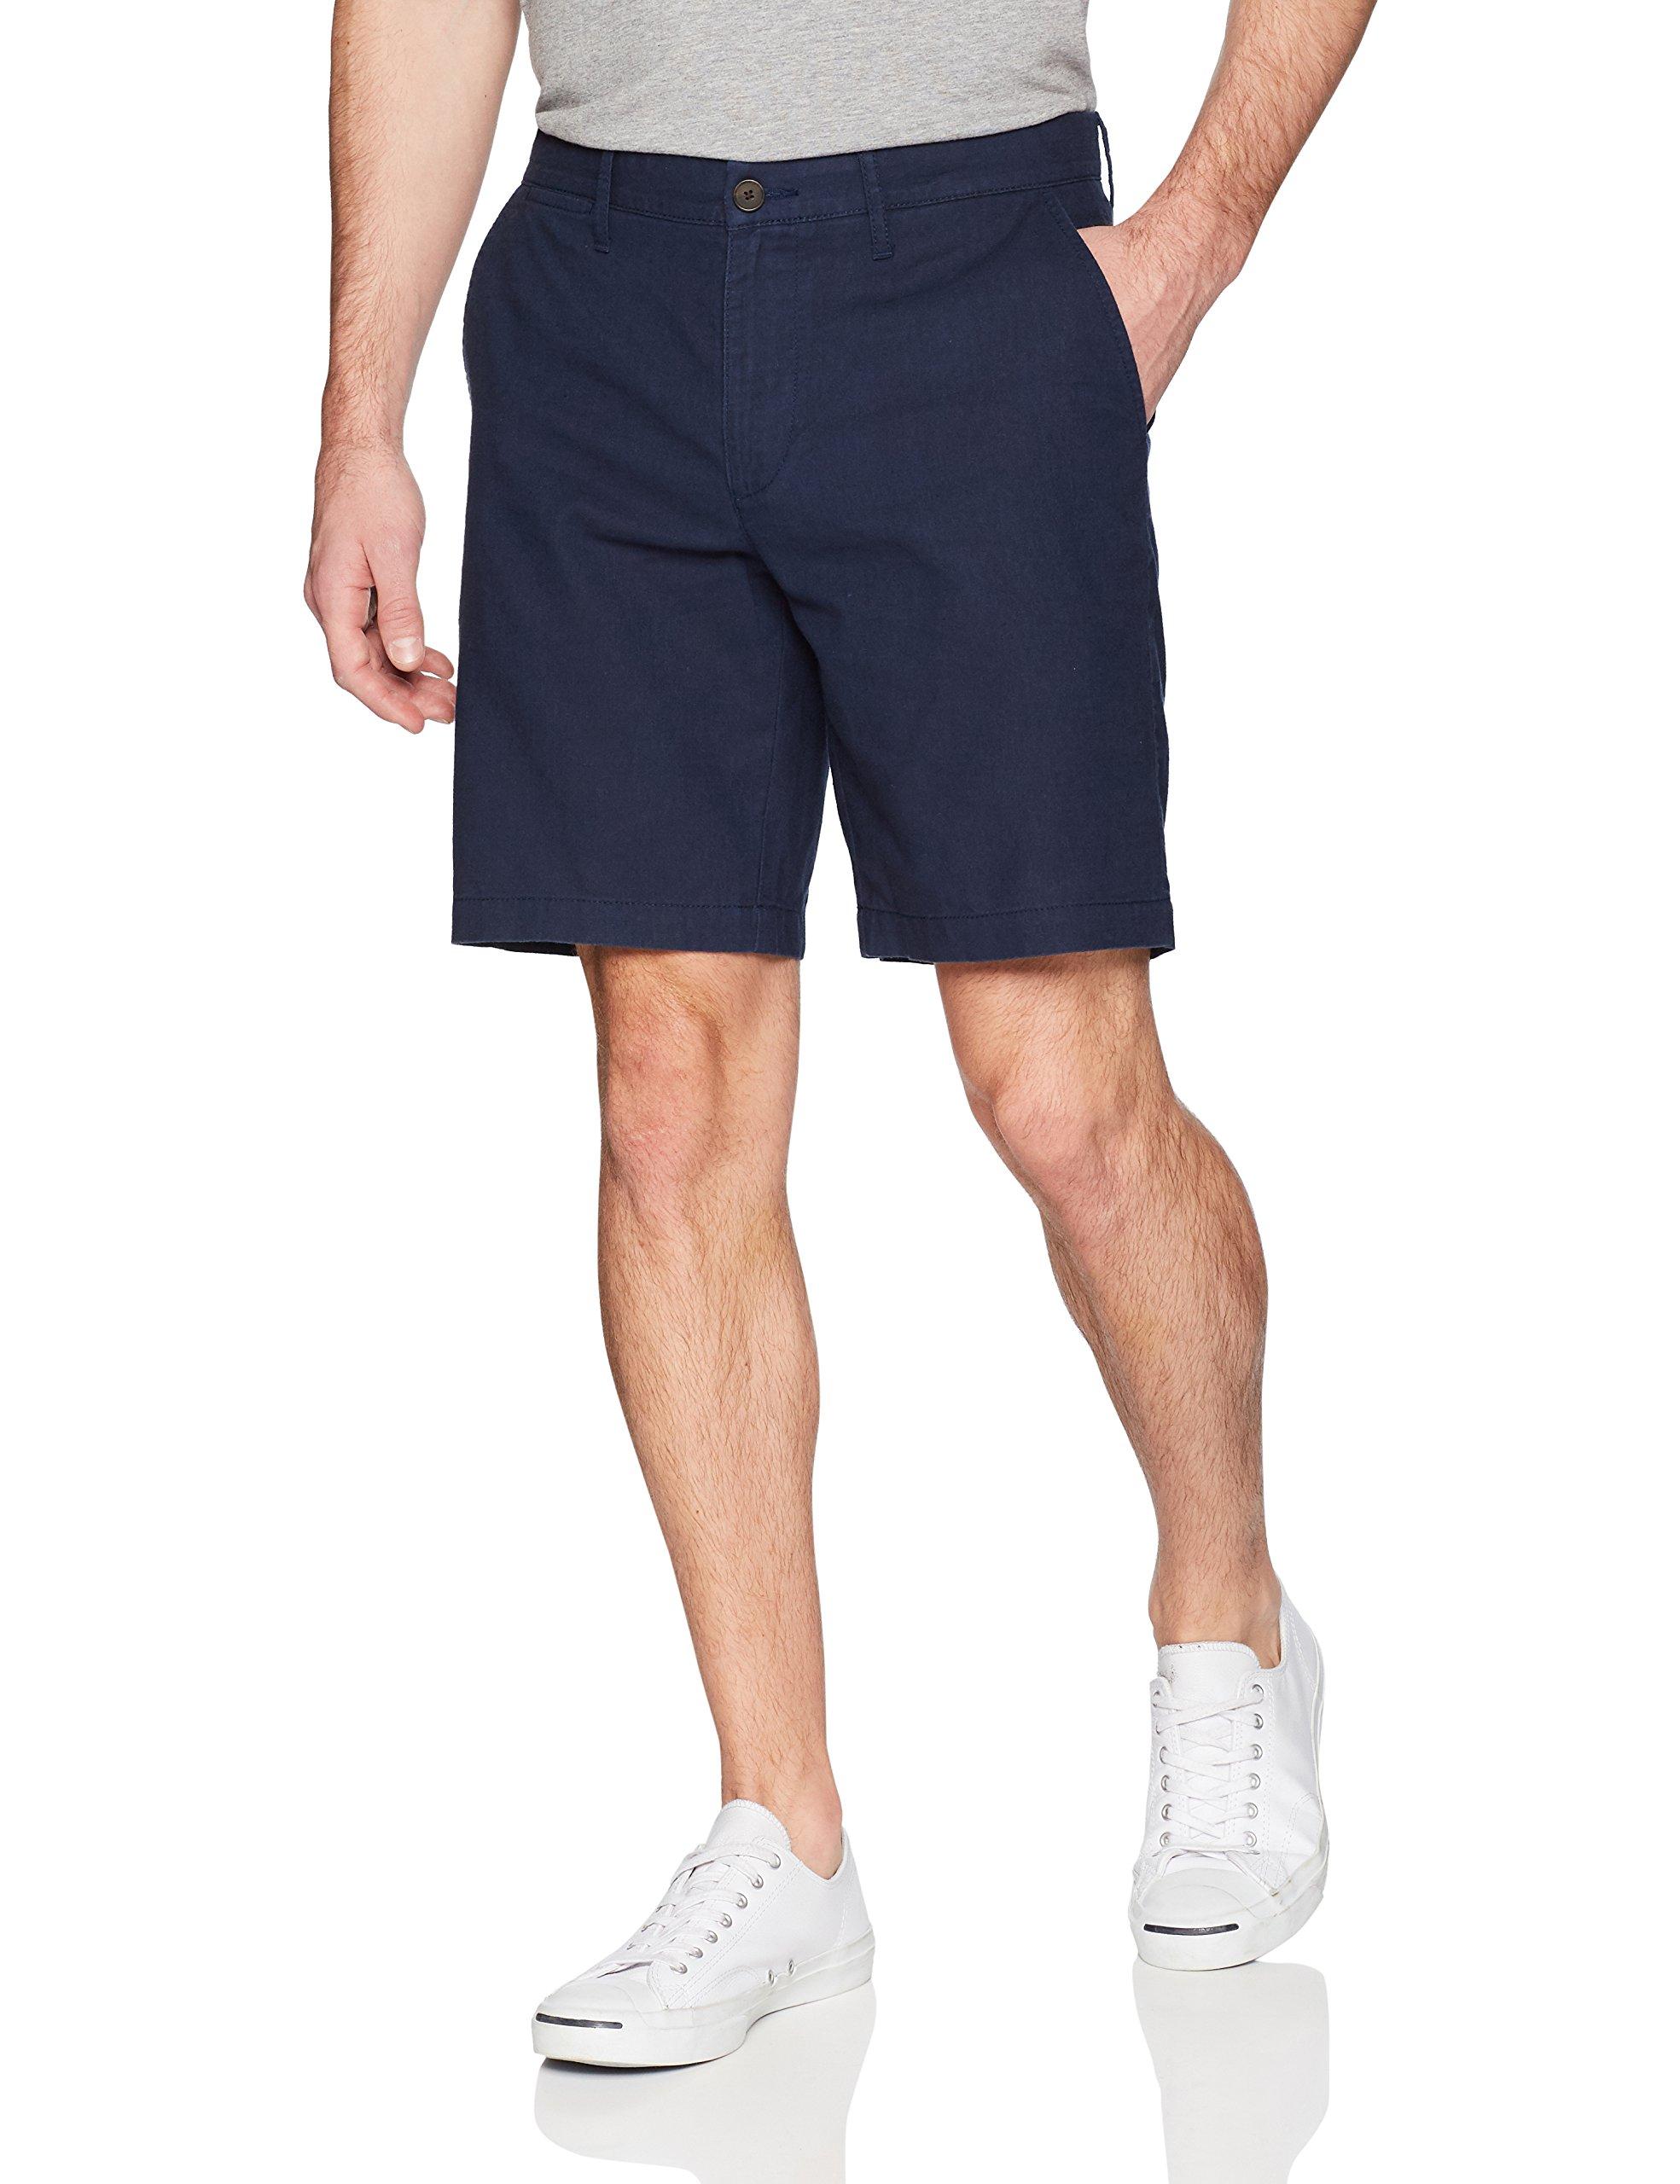 Goodthreads Men's 9'' Inseam Linen Cotton Short, Navy, 34